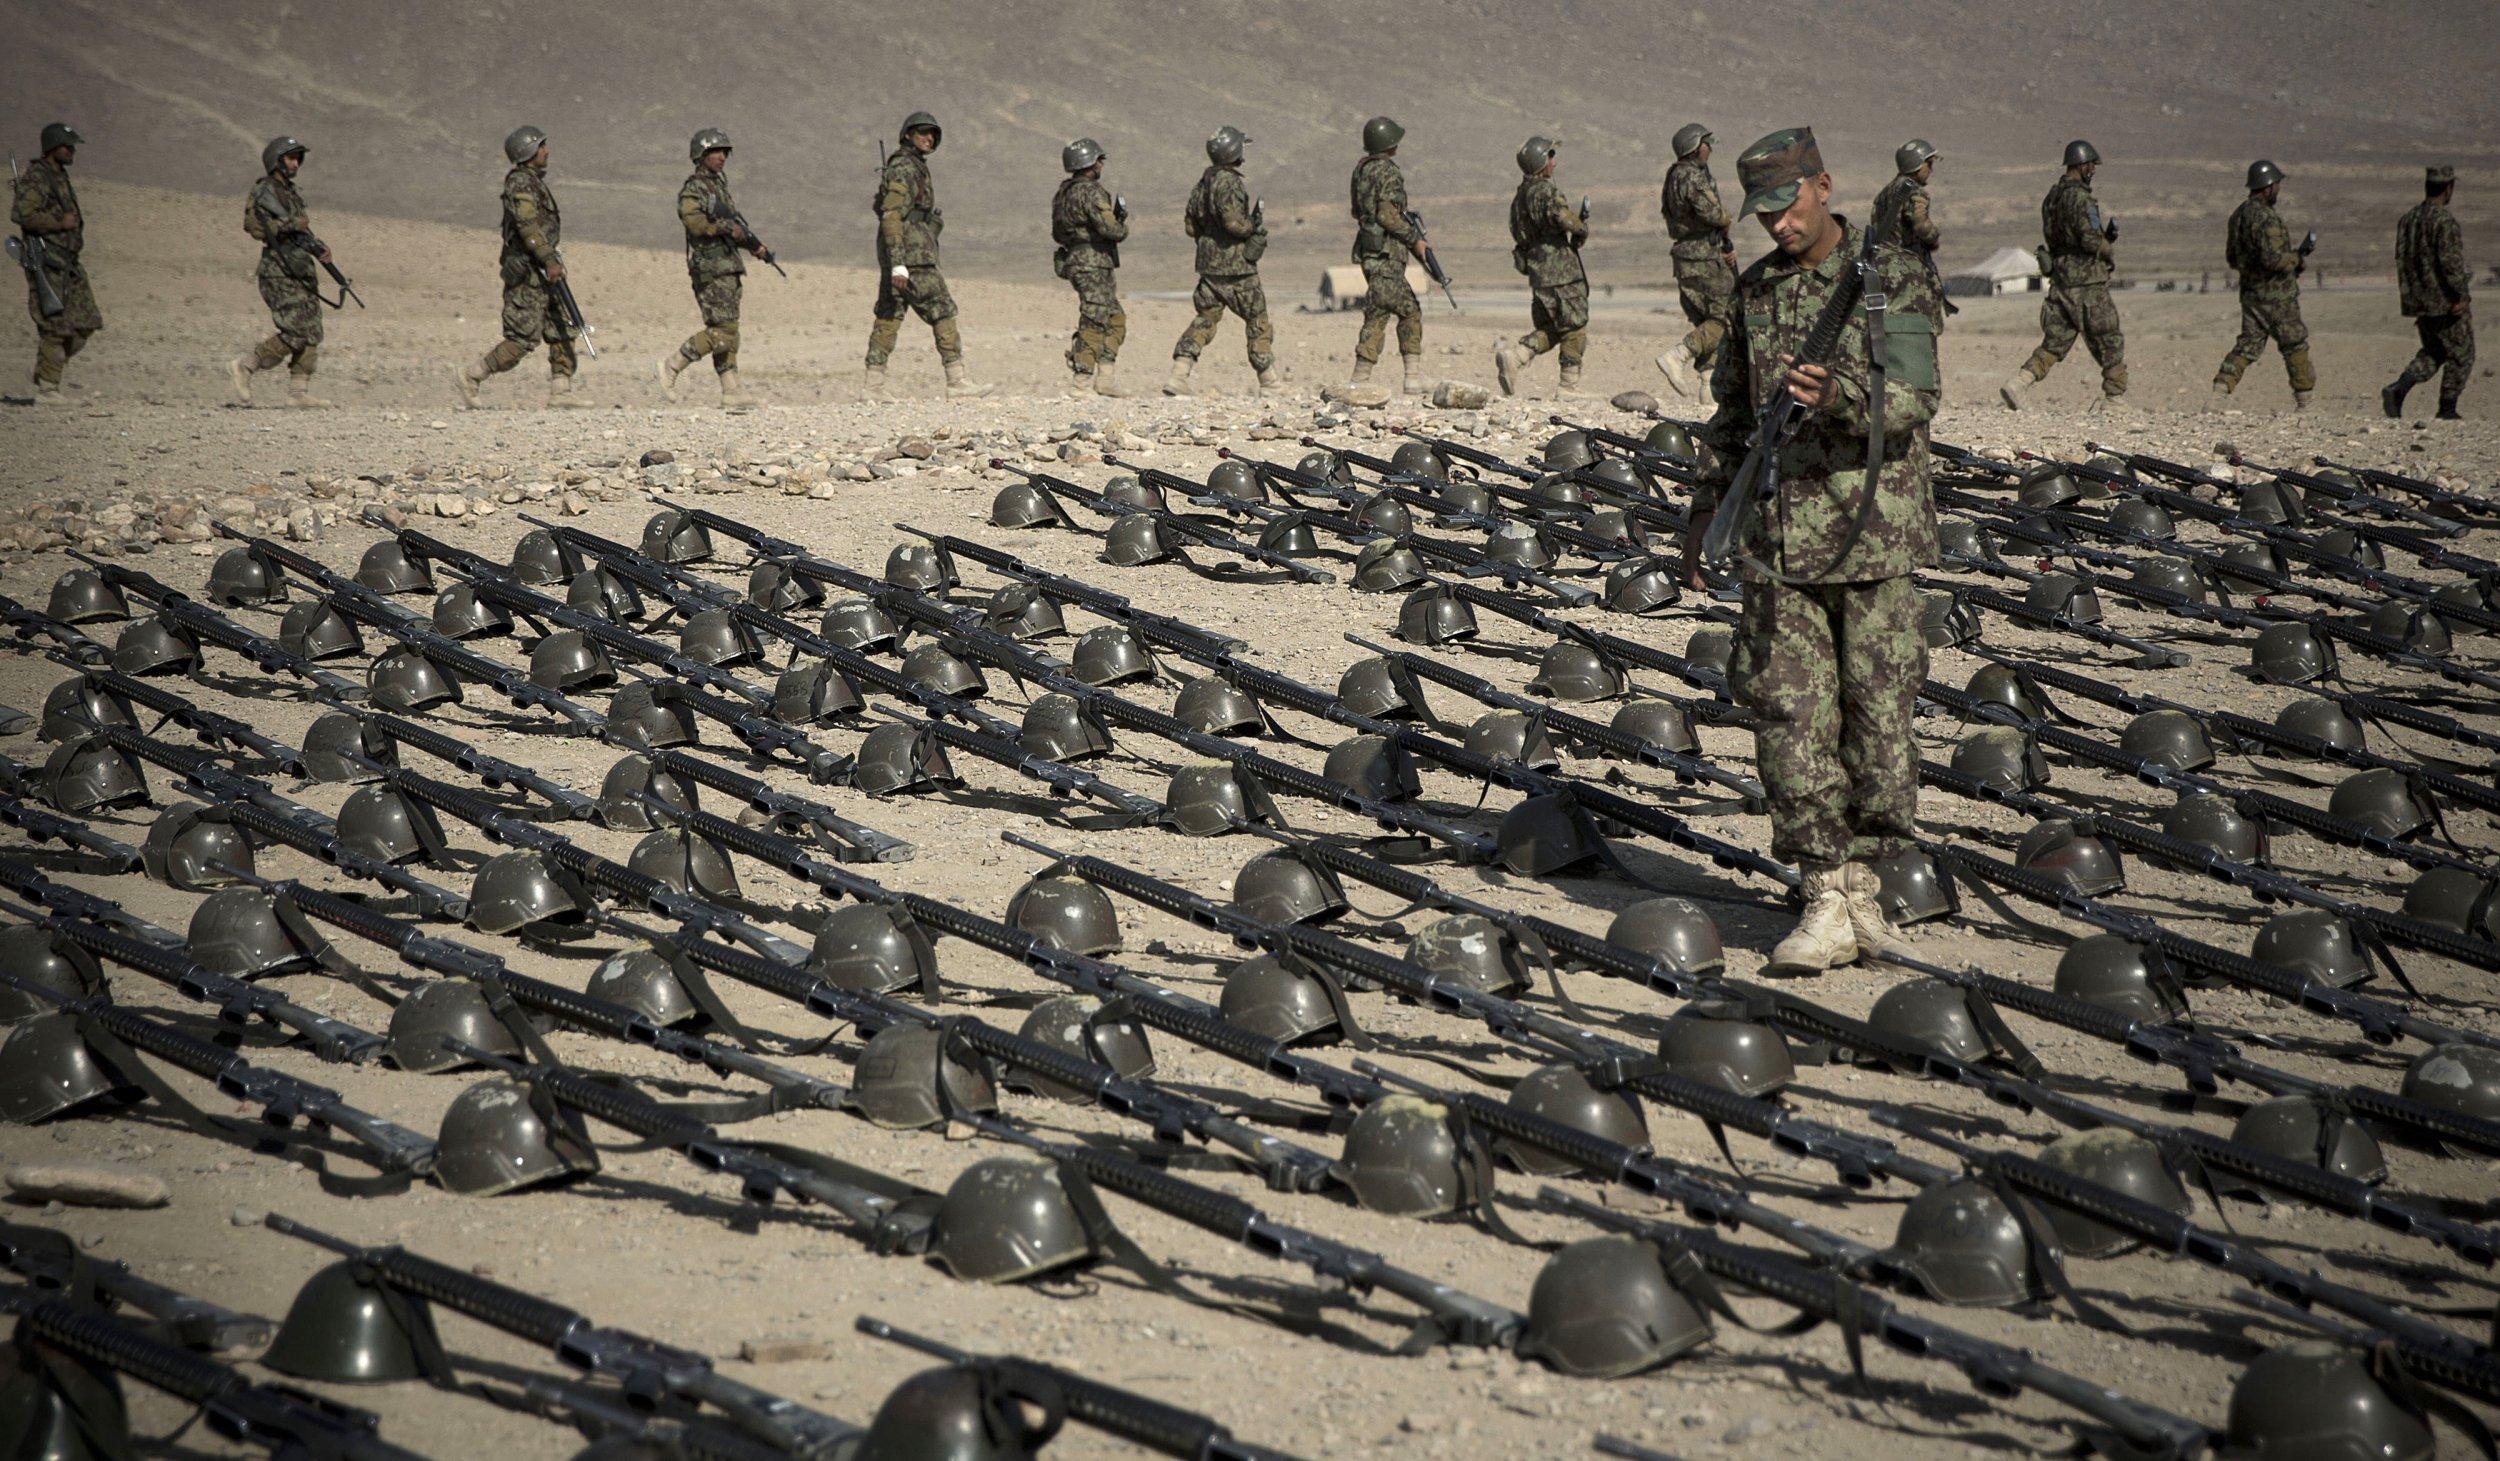 05_22_AfghanWeapons_01